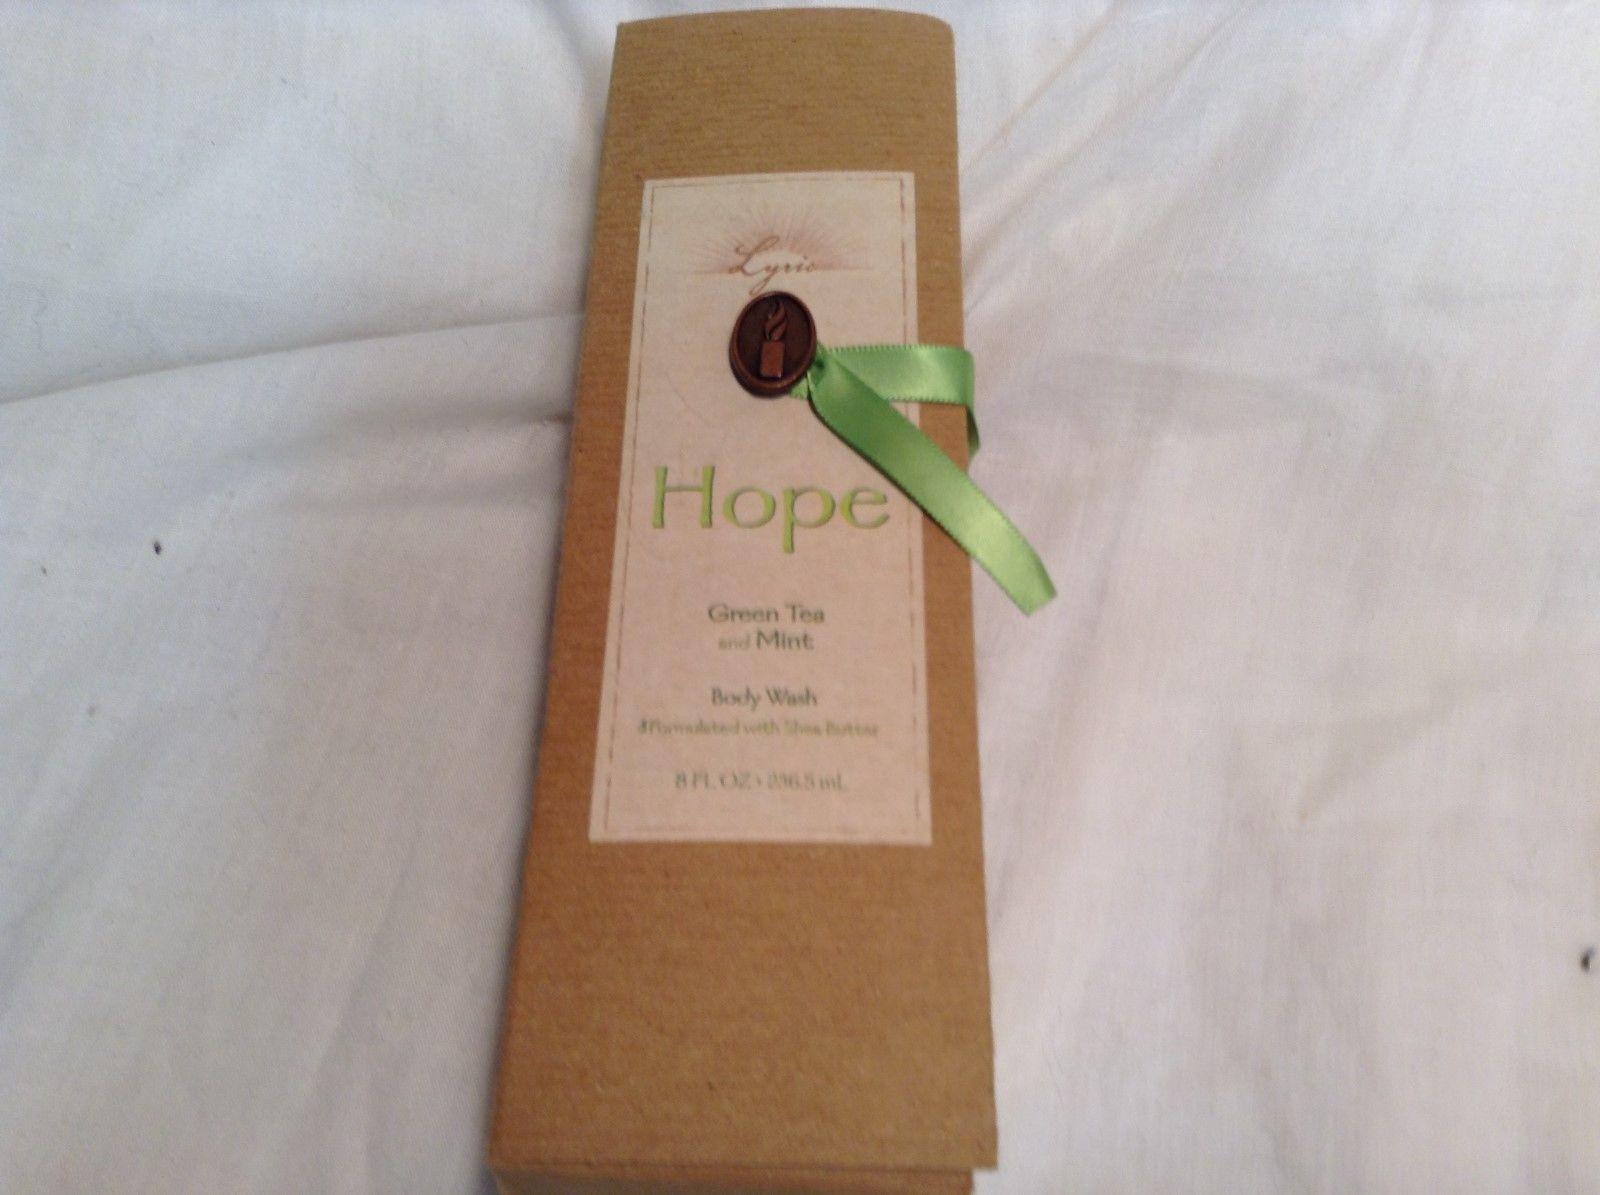 NEW Lyric 8floz Body Wash w Shea Butter Green Tea Mint Scent